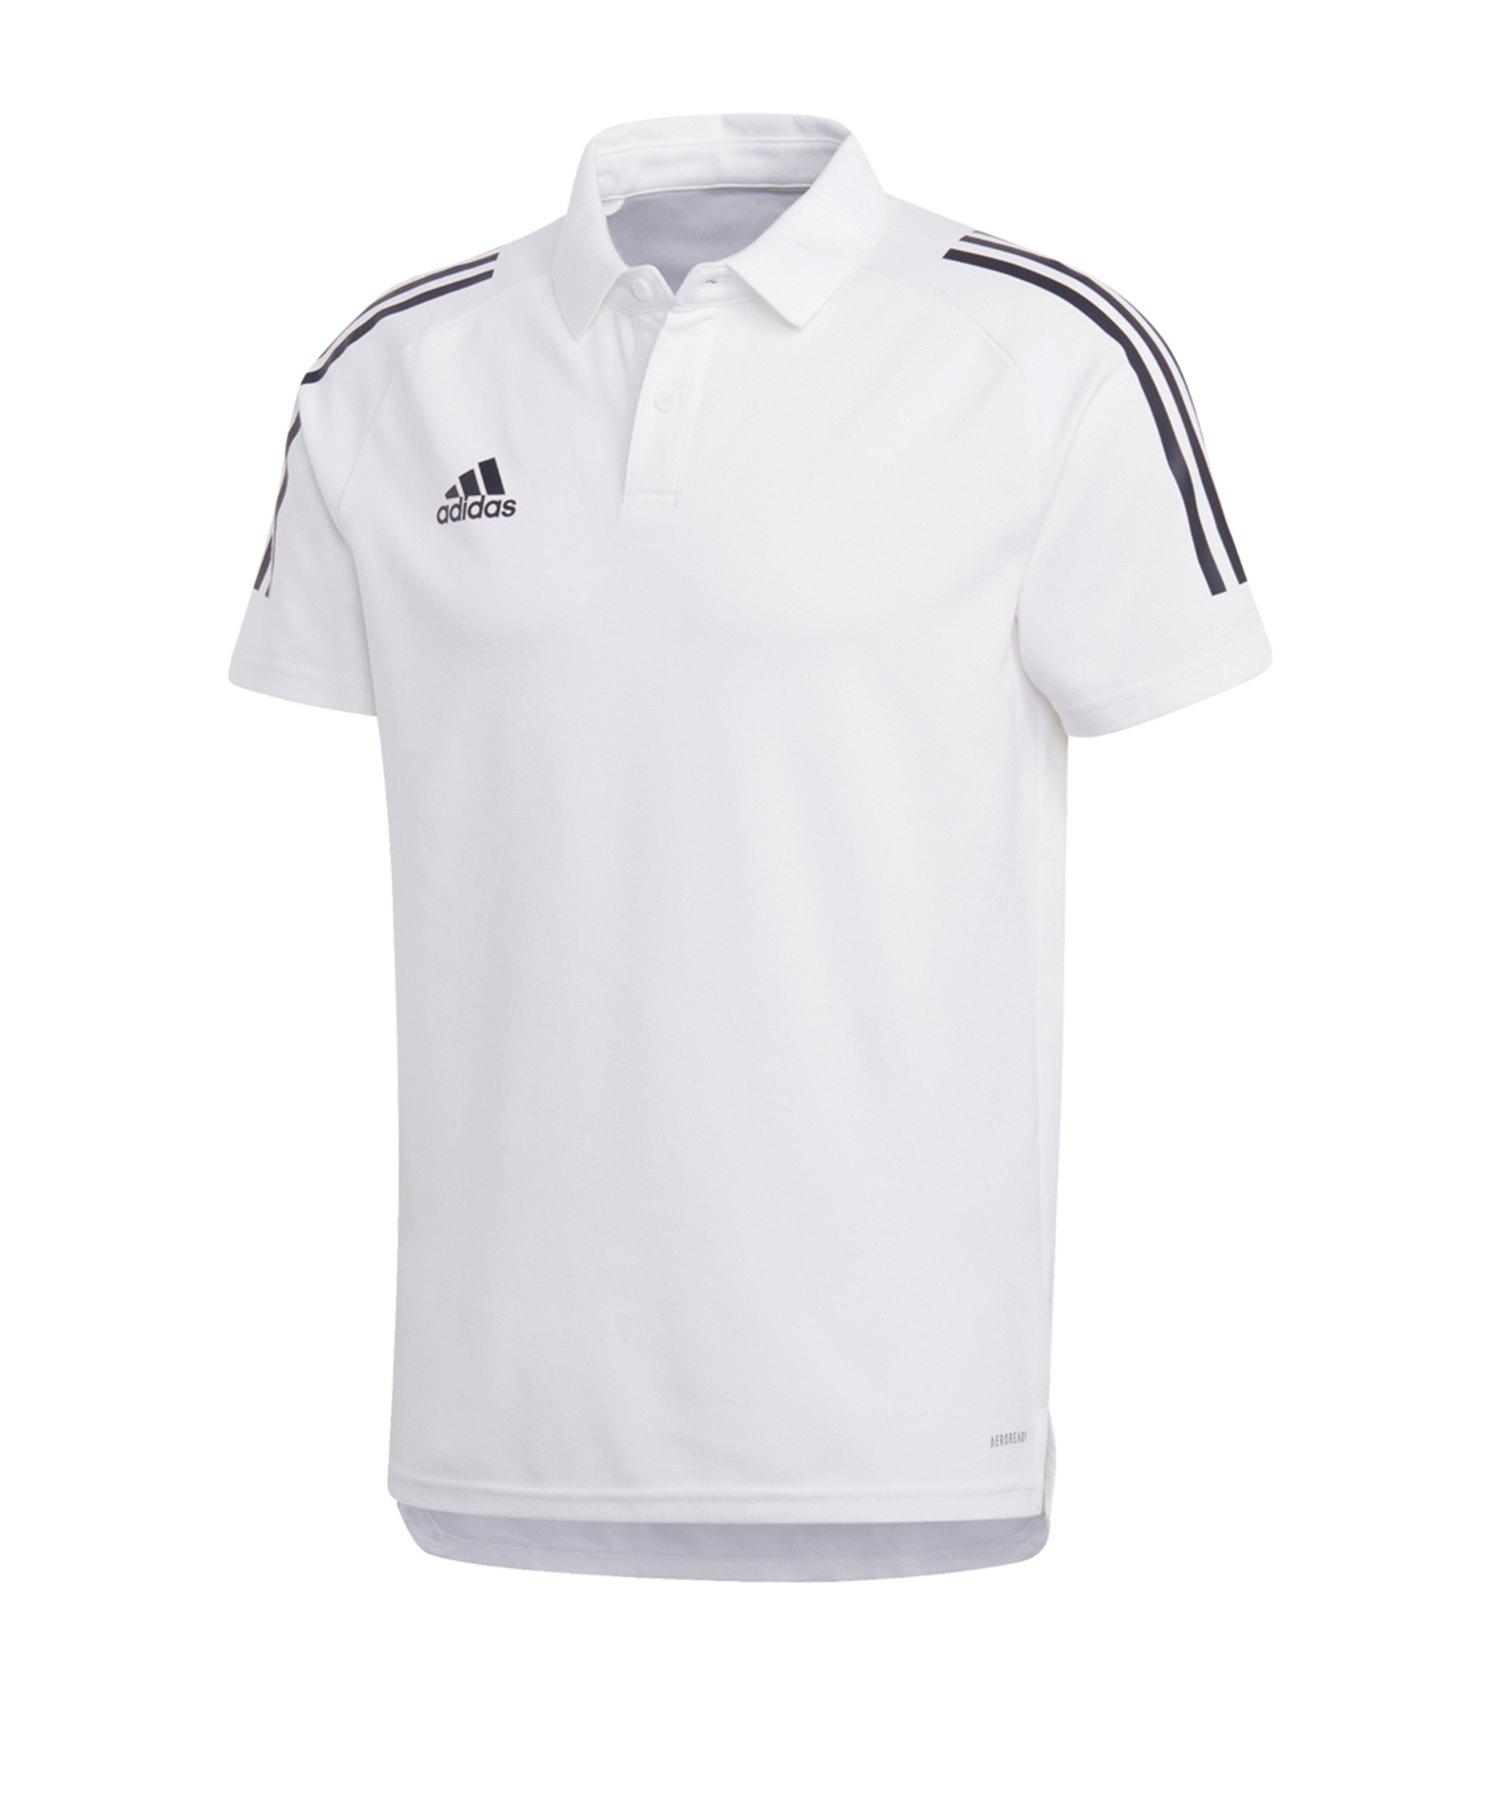 adidas Condivo 20 Poloshirt Weiss Schwarz - weiss